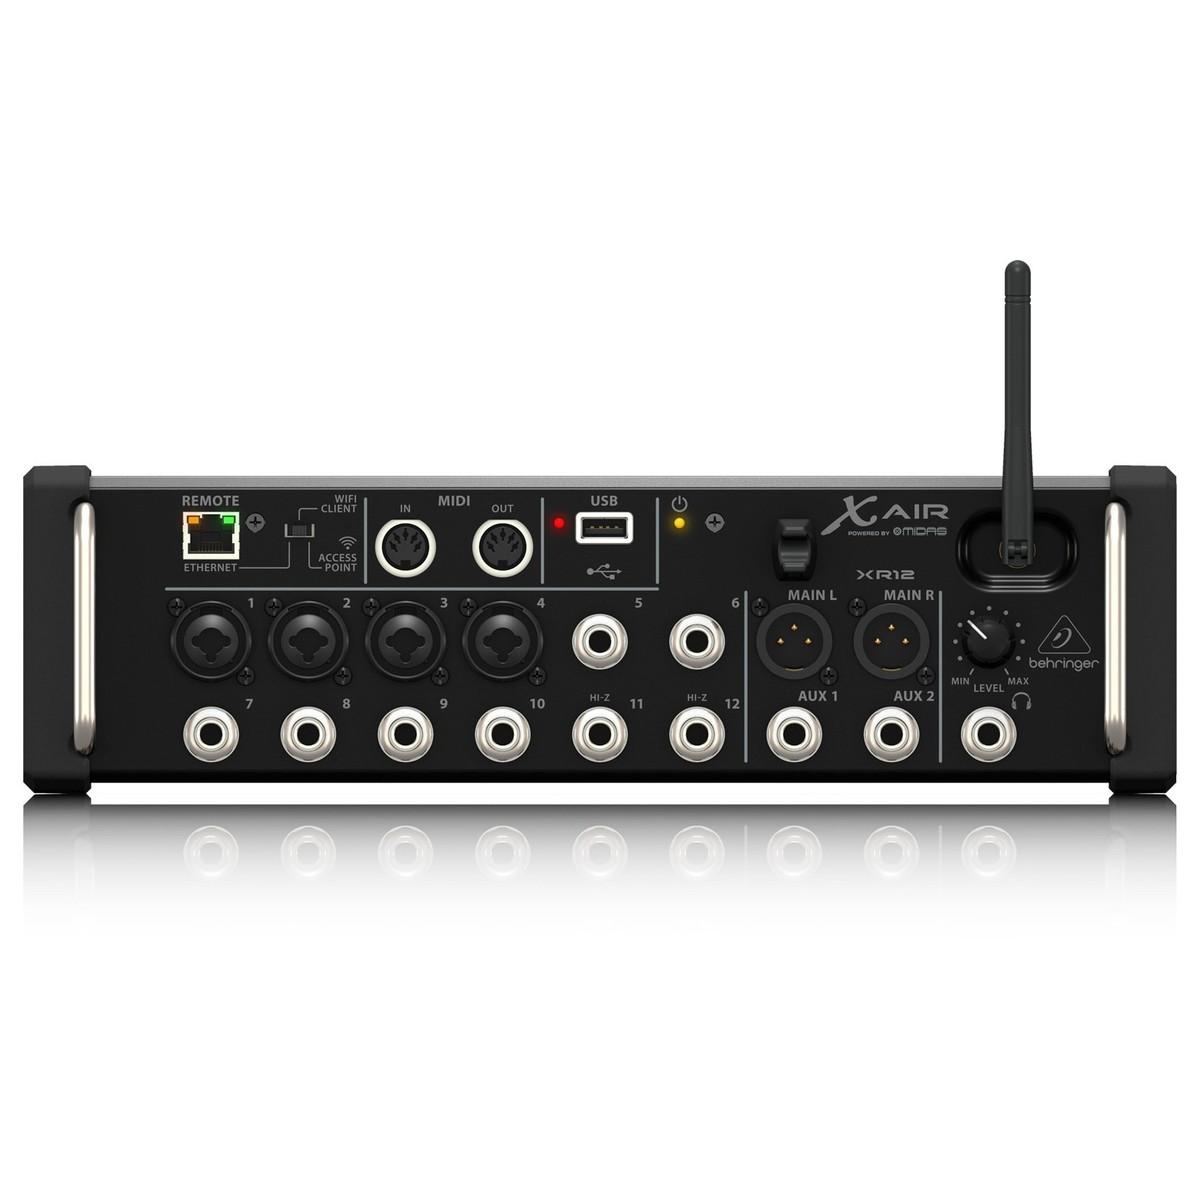 behringer x air xr12 12 channel digital mixer at gear4music. Black Bedroom Furniture Sets. Home Design Ideas